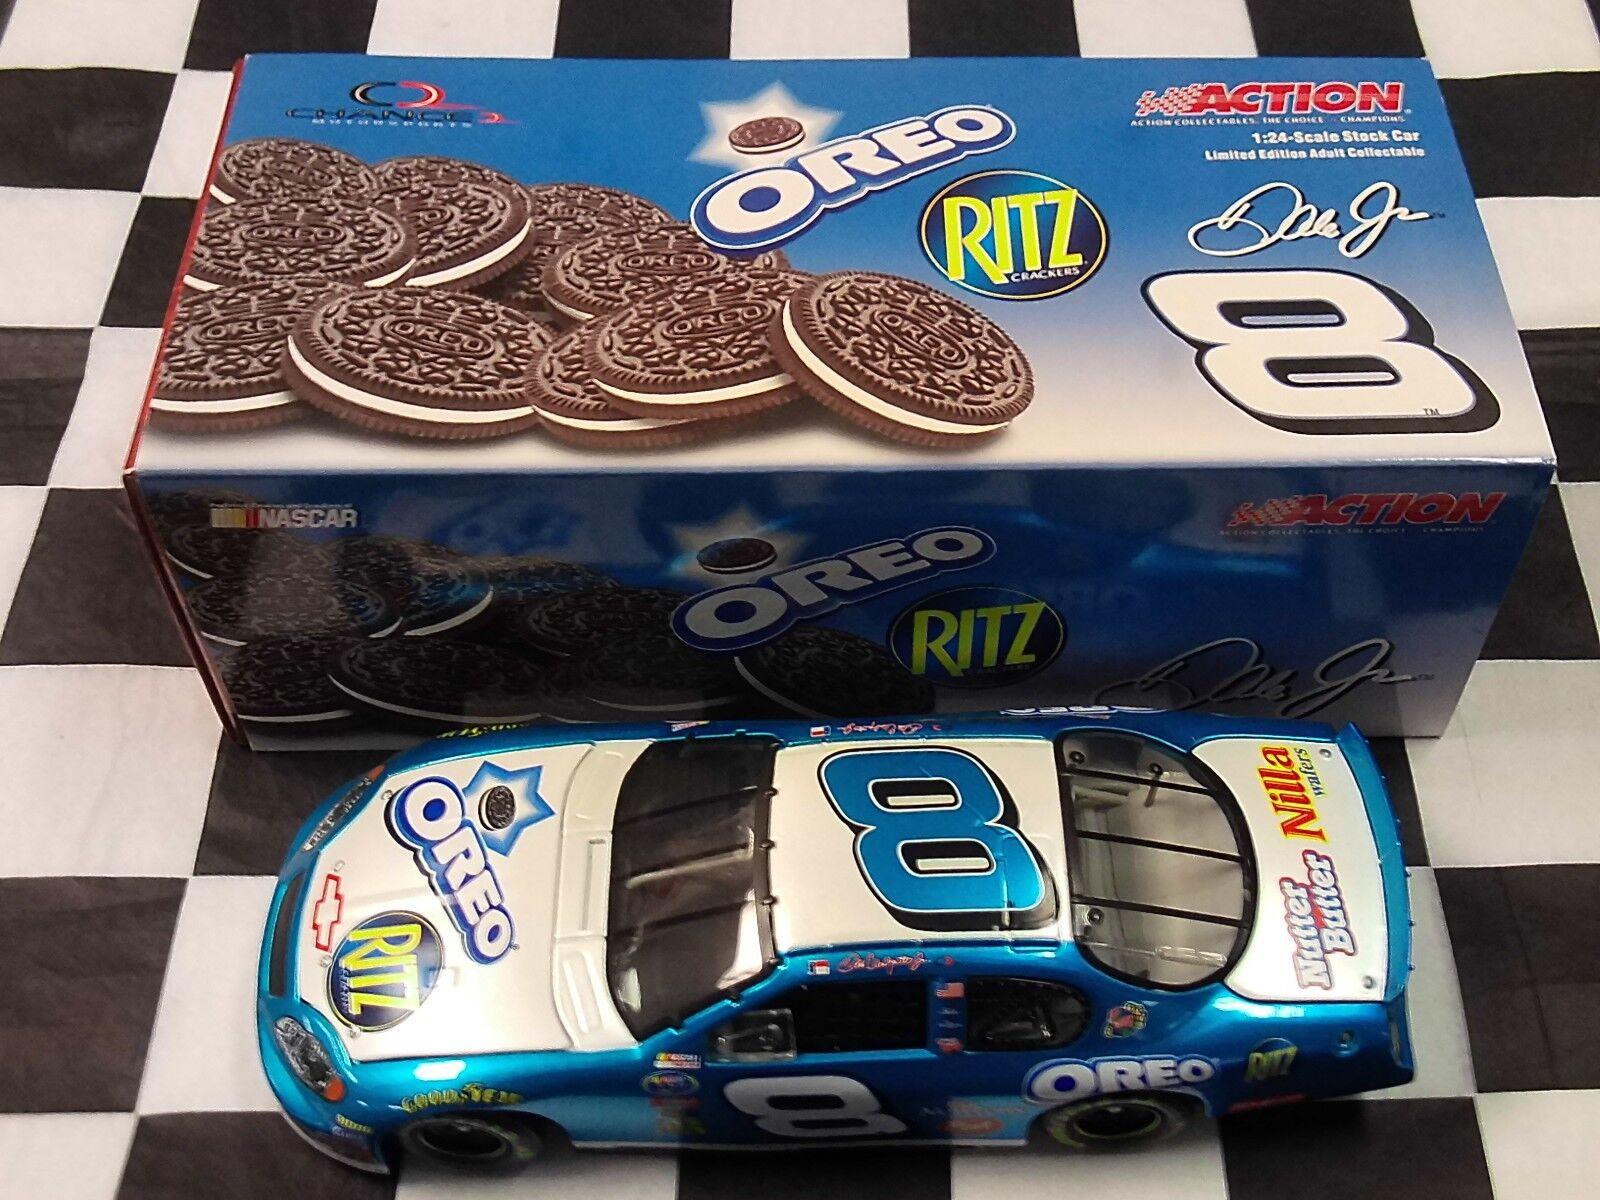 Dale Earnhardt Jr  8 Oreo Ritz 2004 Monte Carlo 1:24 Action NIB NASCAR 105670